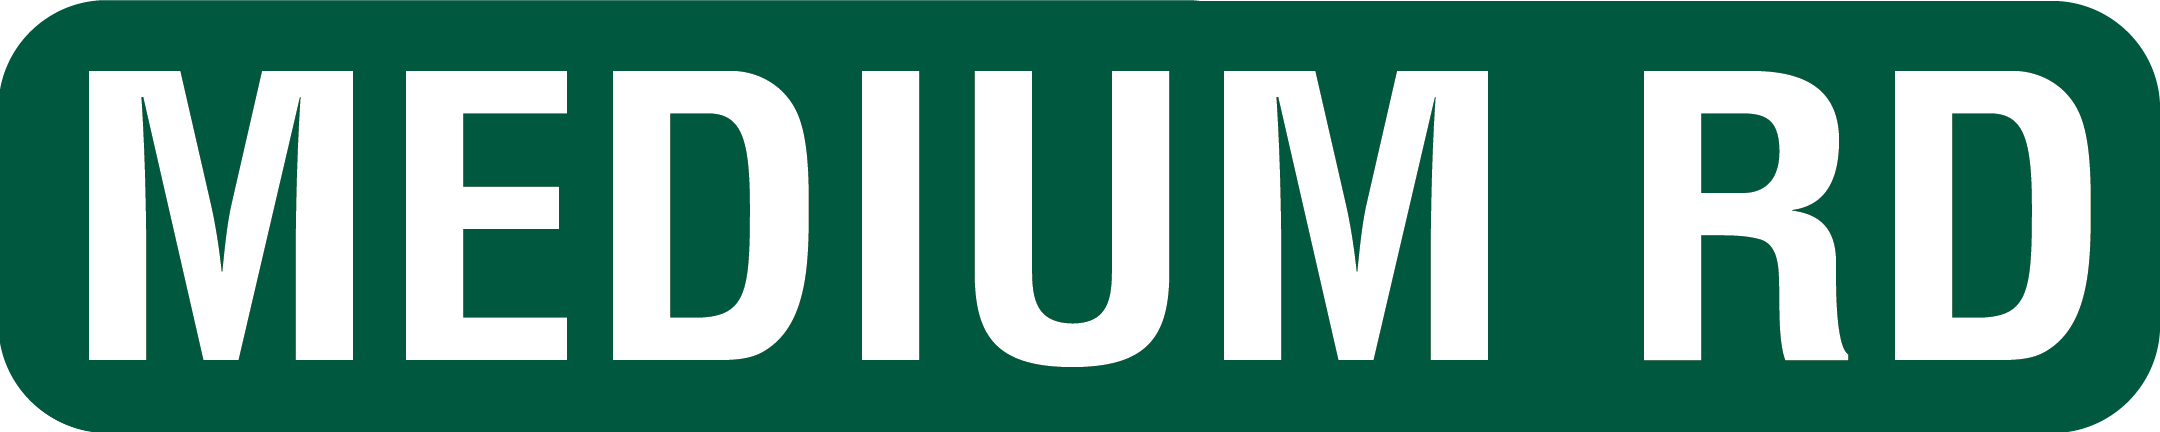 6x30 Street Sign for Medinum Road Names